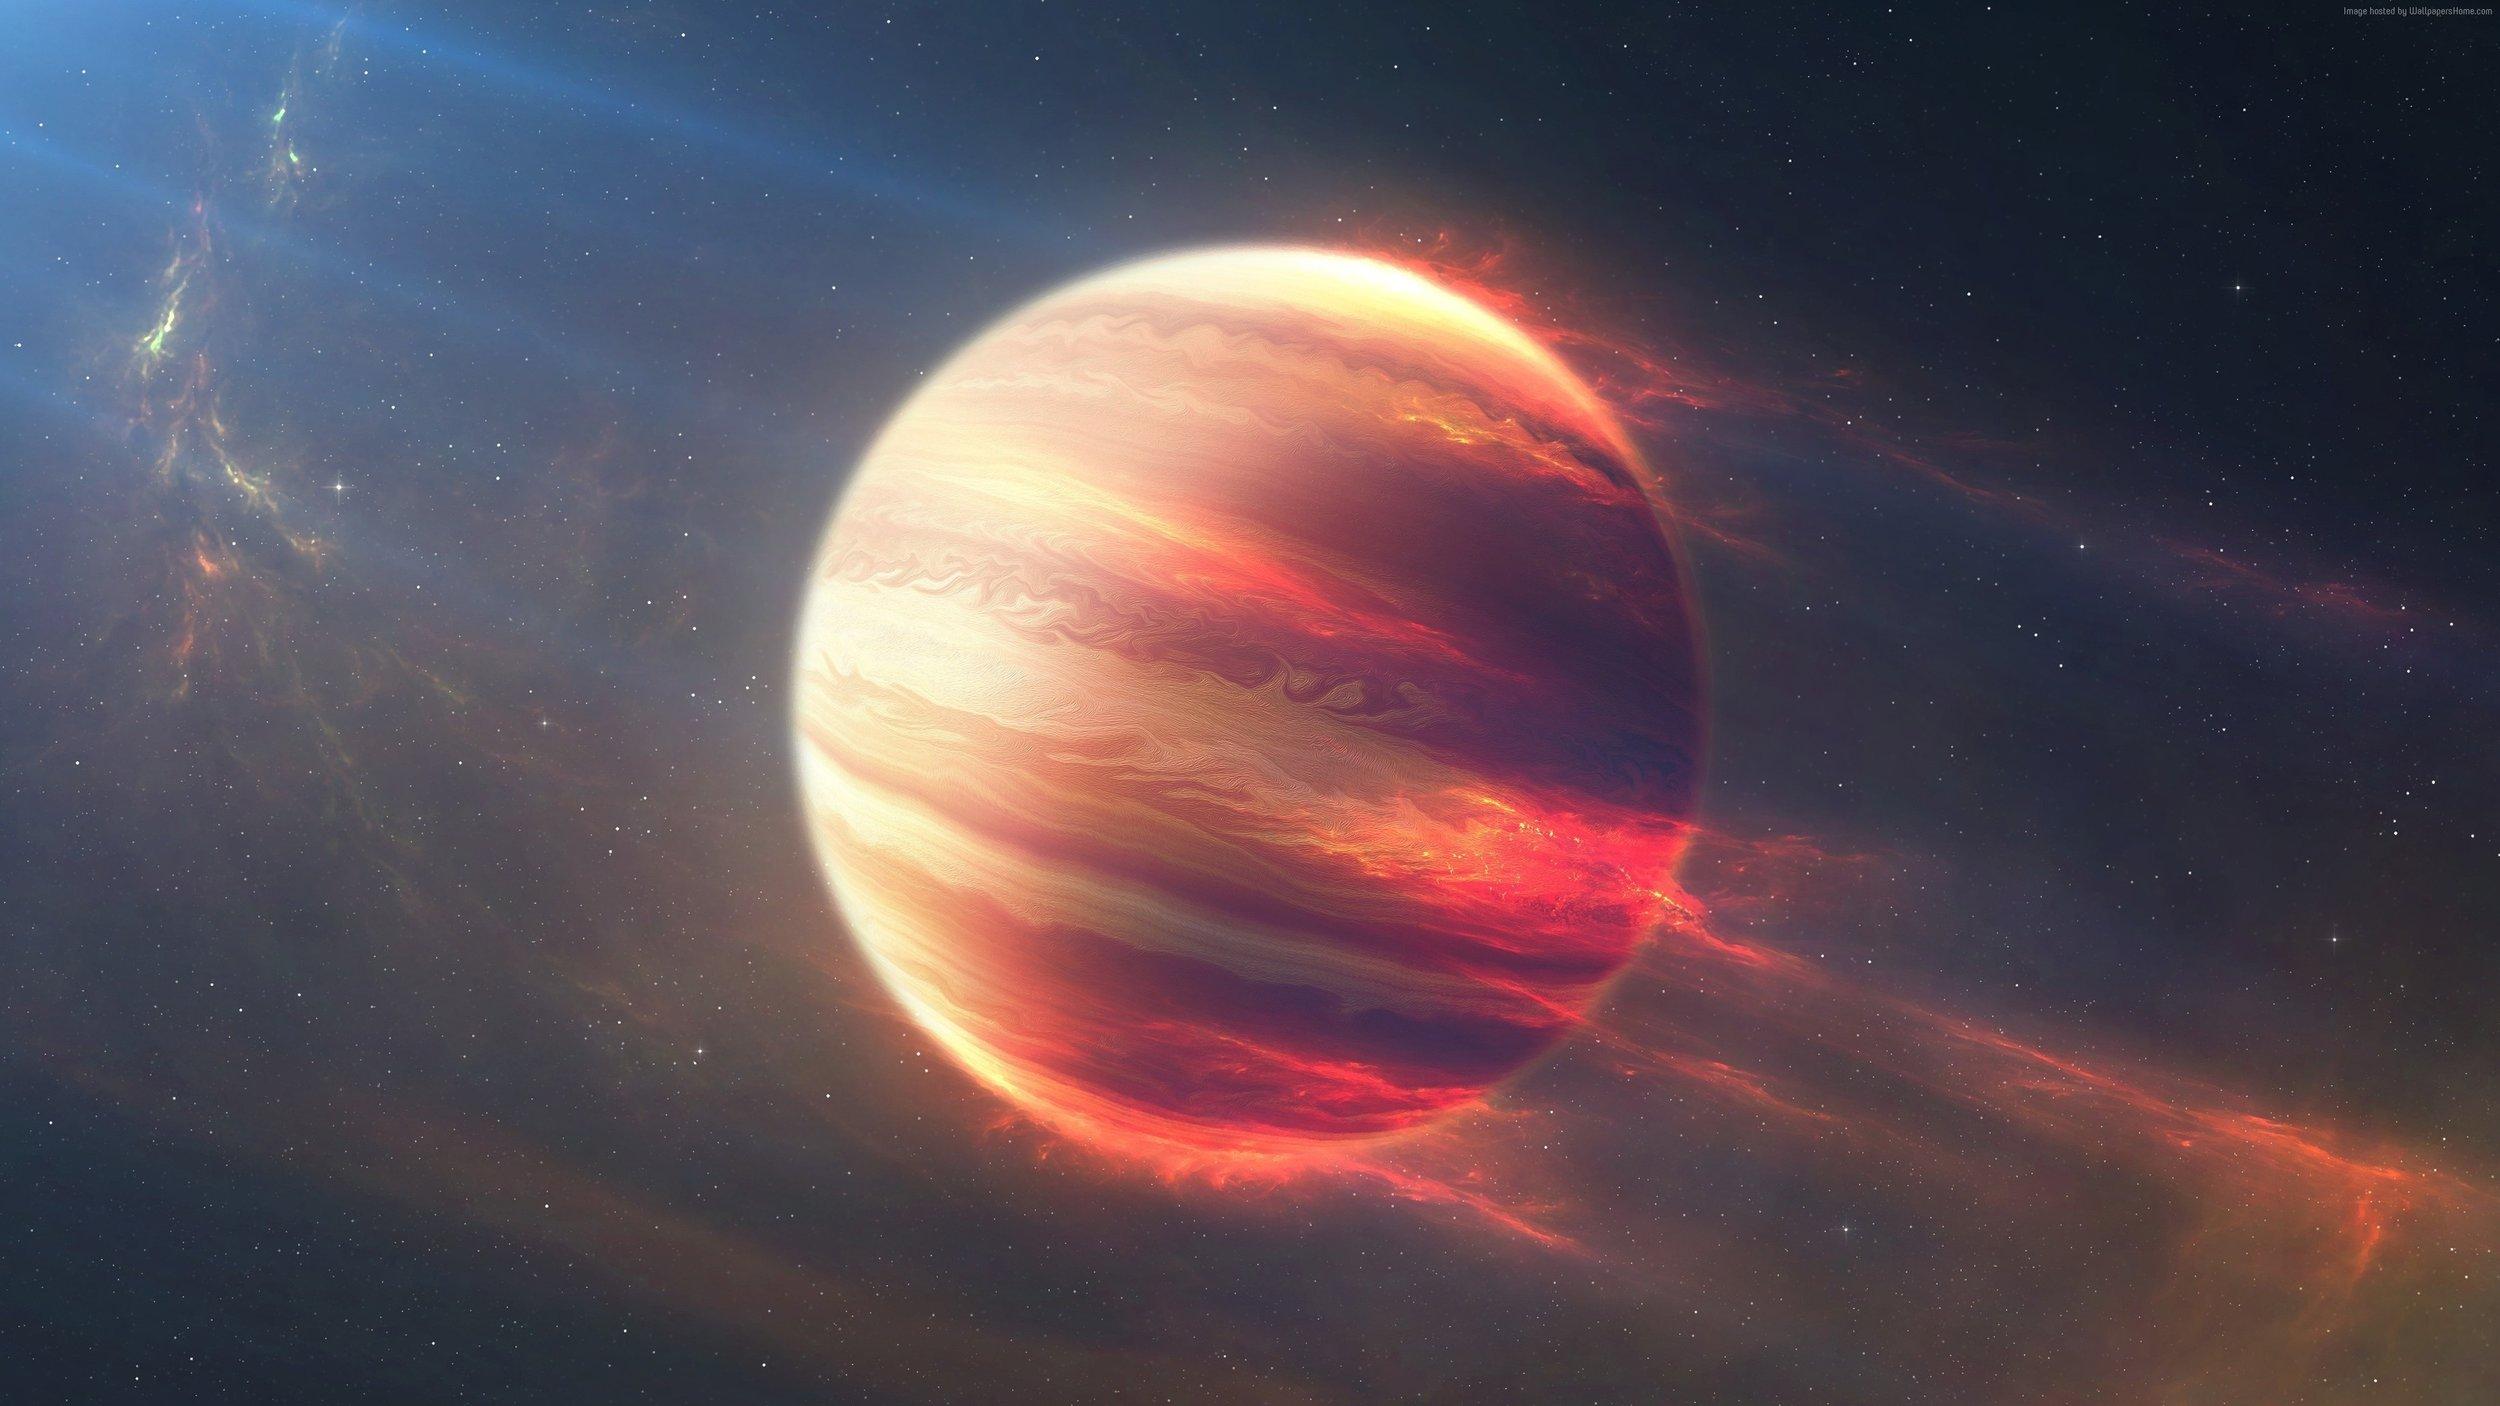 space-red-hot-planet-fantasy-4k.jpg